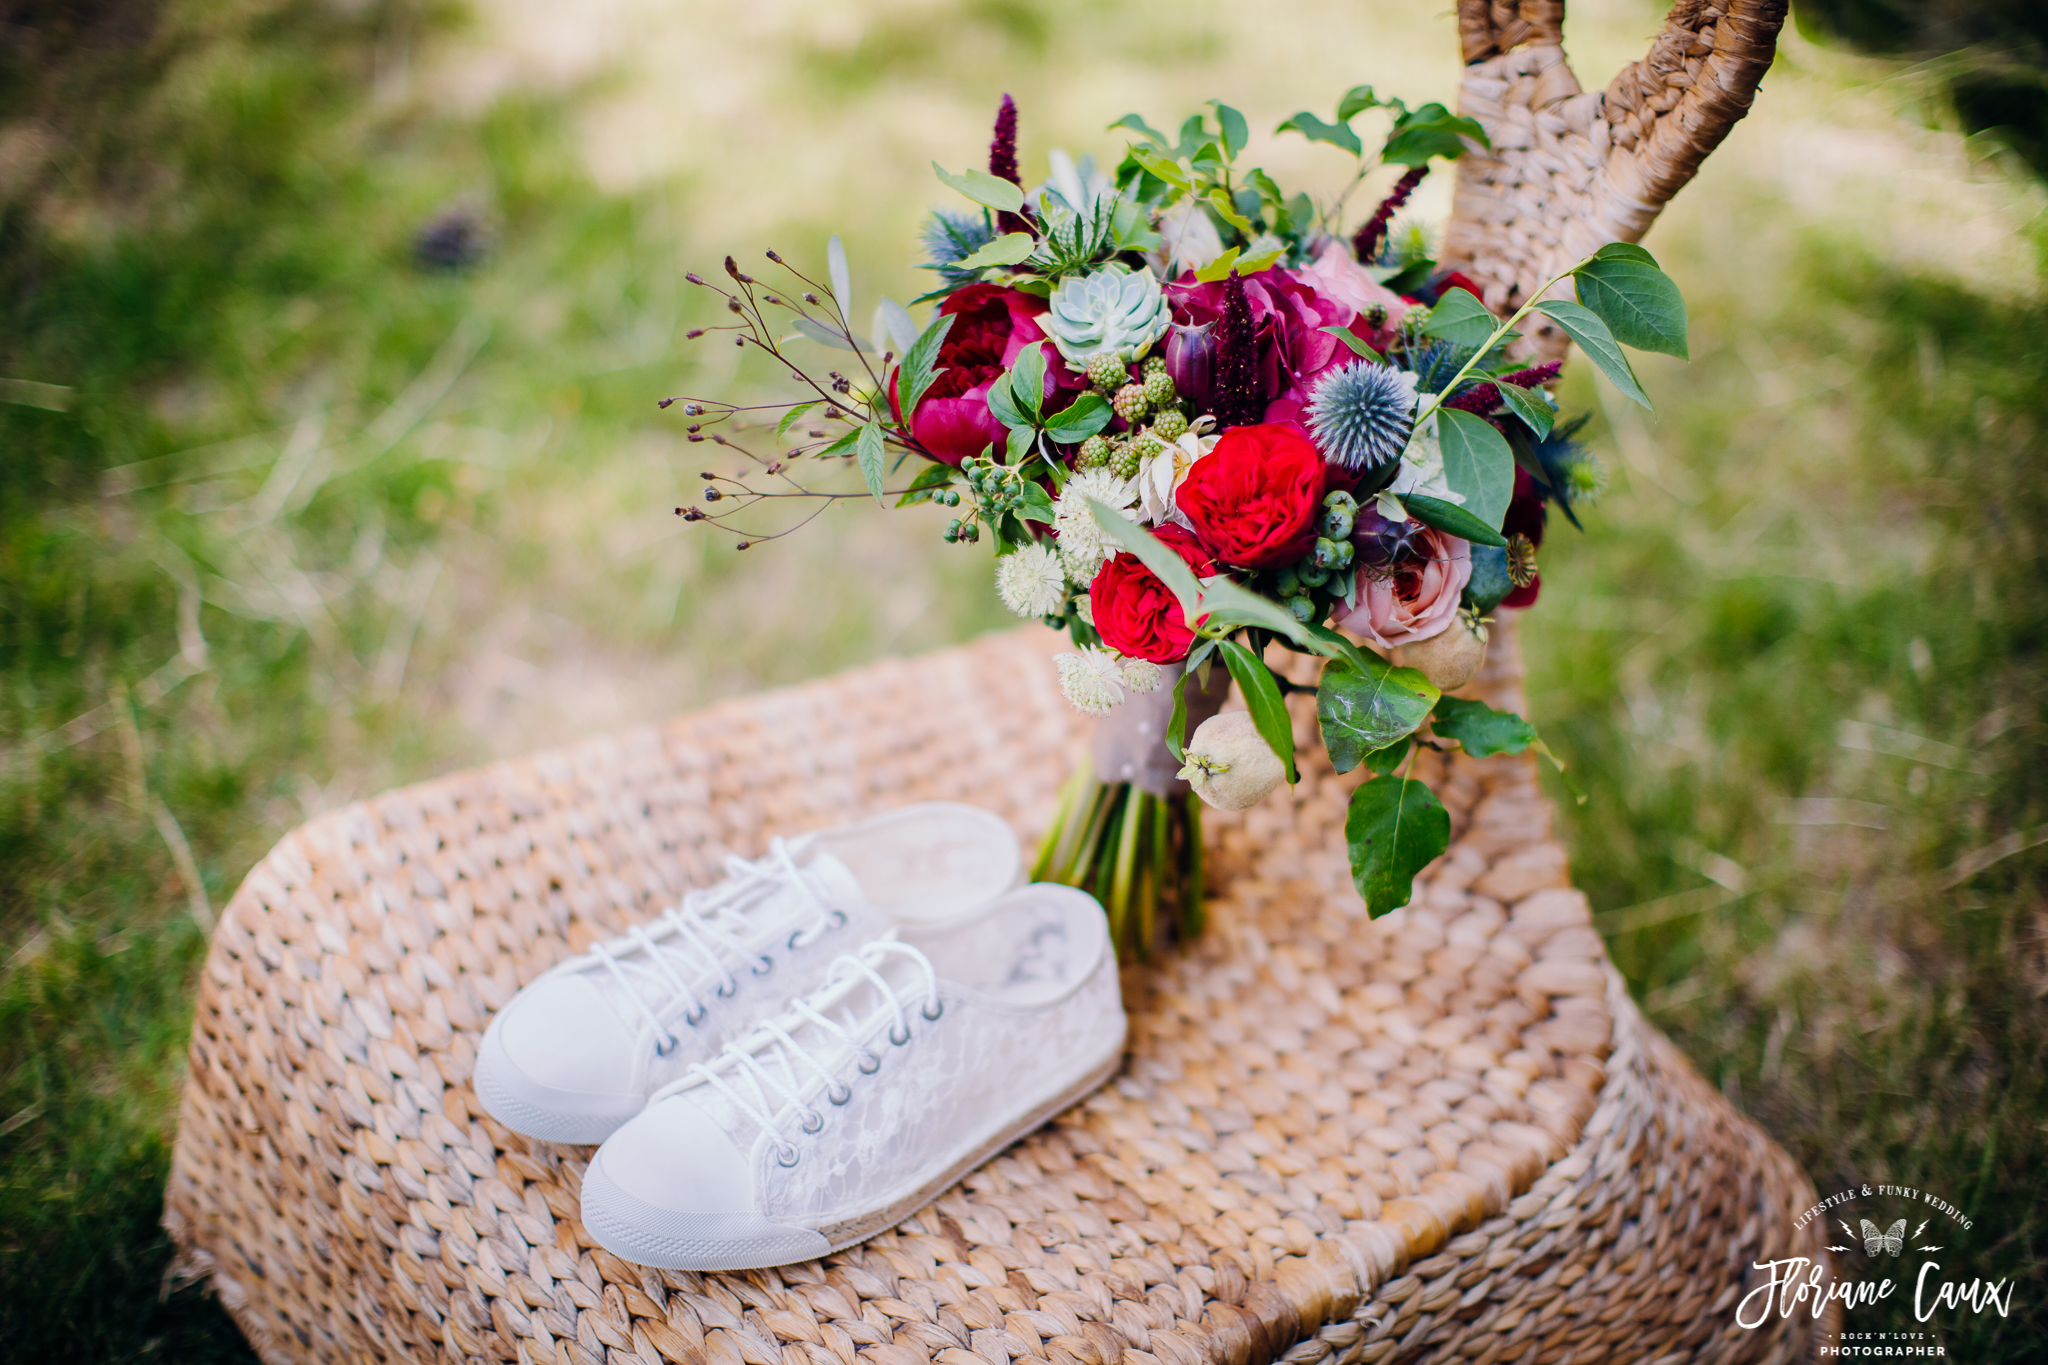 photographe-mariage-toulouse-rocknroll-maries-tatoues-floriane-caux-4